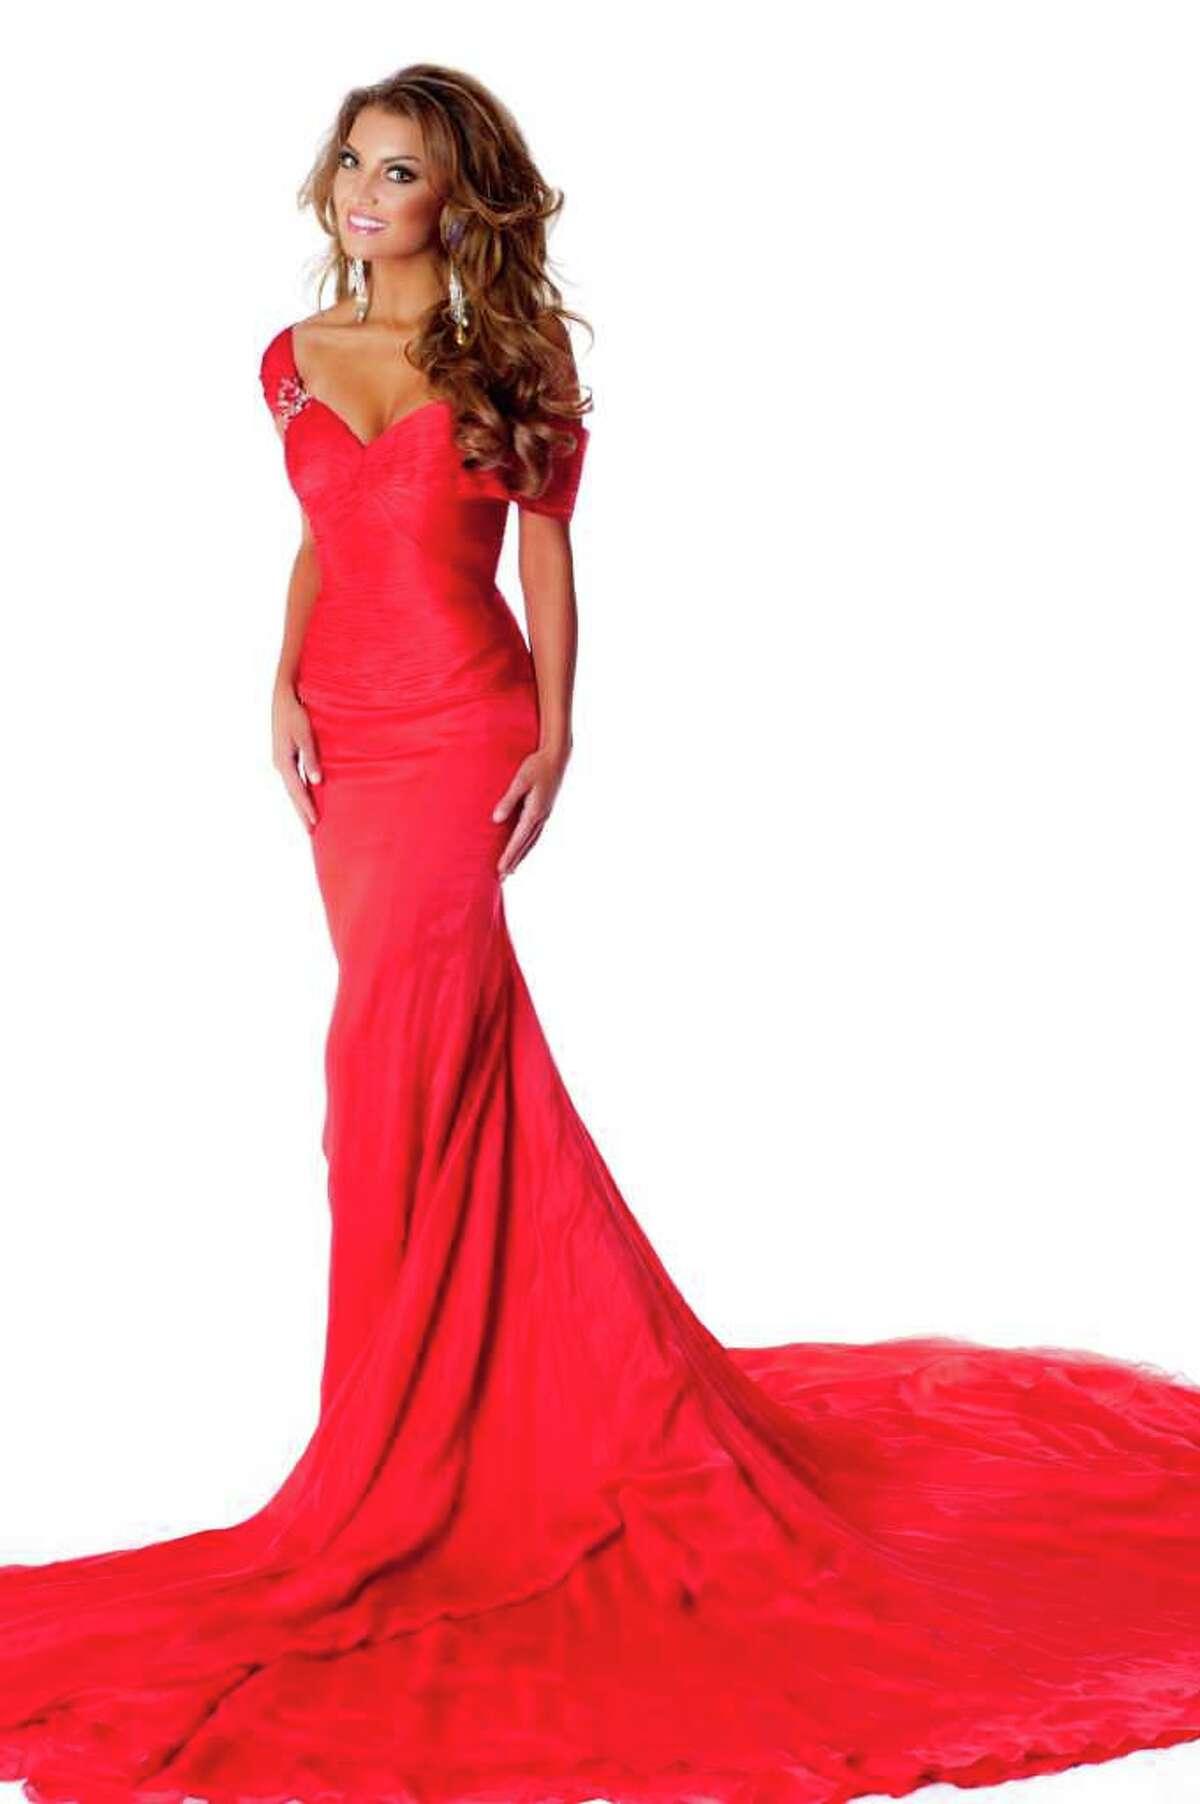 Miss Arizona USA 2011, Brittany Dawn Brannon.